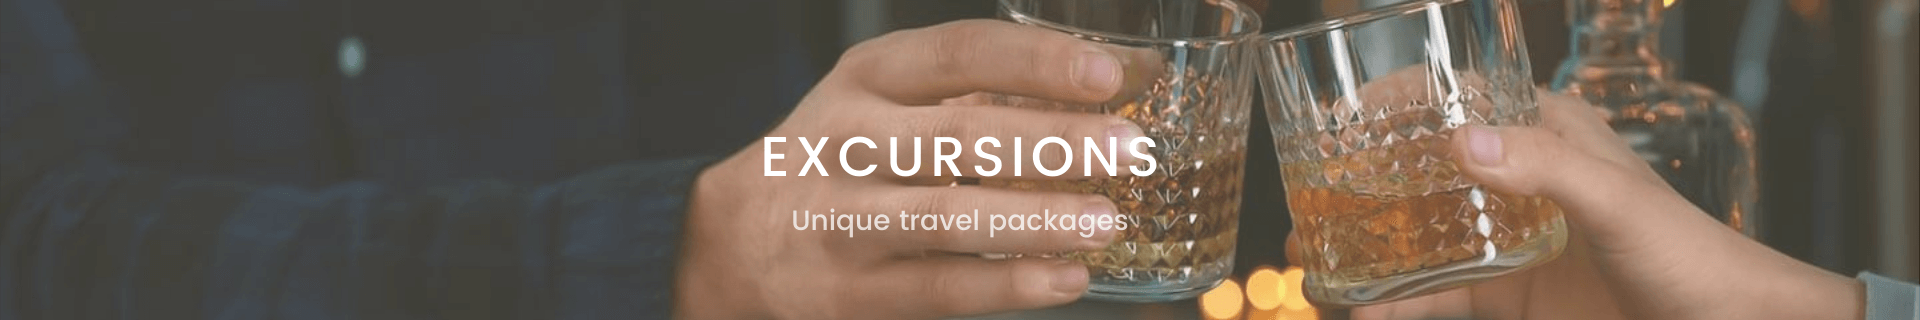 Excursions Image Button